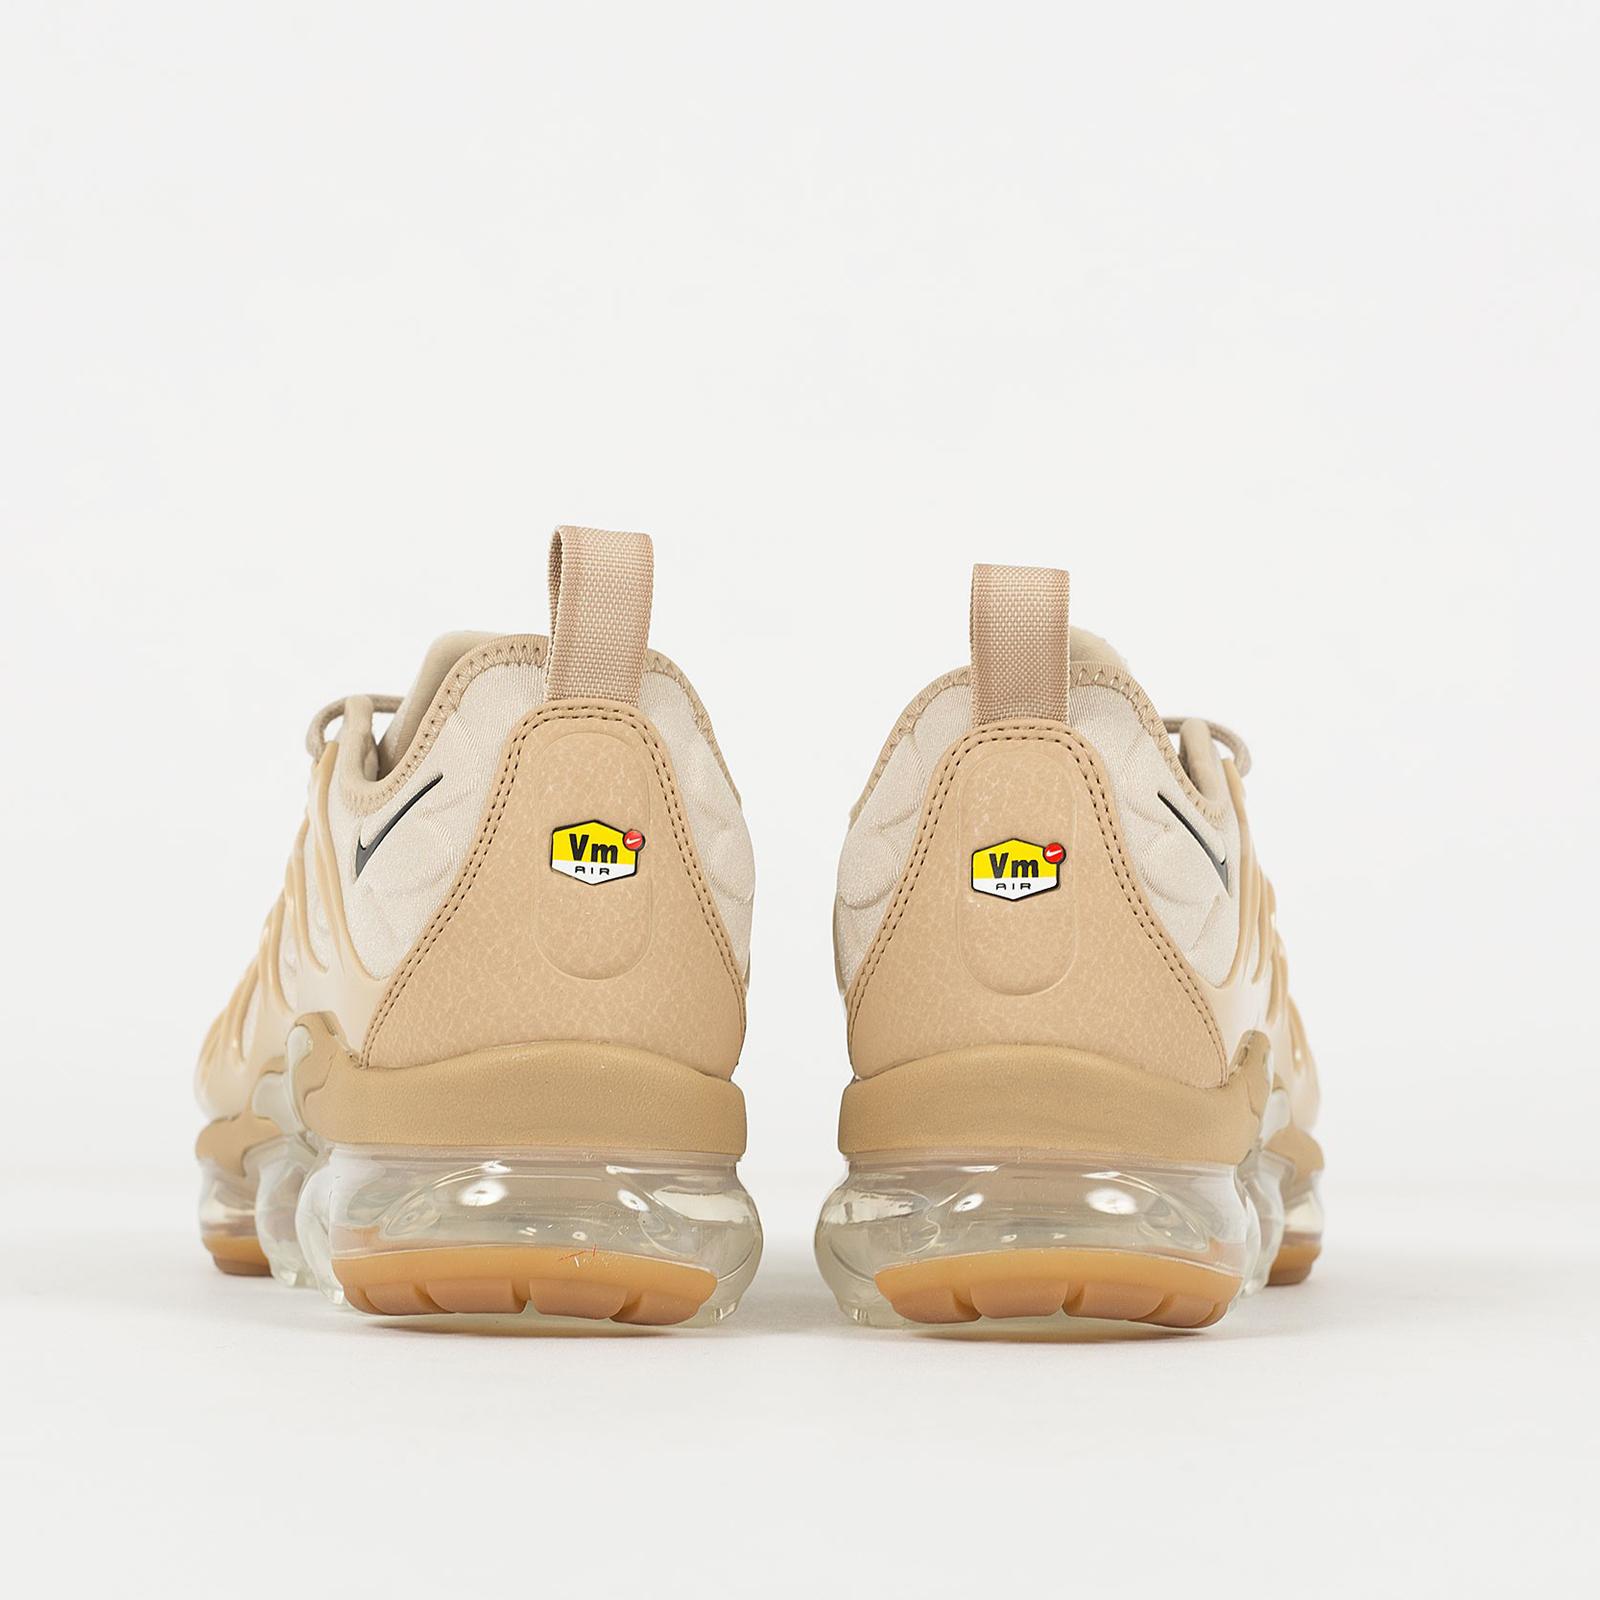 afe90a768df6b Nike Air VaporMax Plus (String  Black  Desert Gum  Light Brown) Men